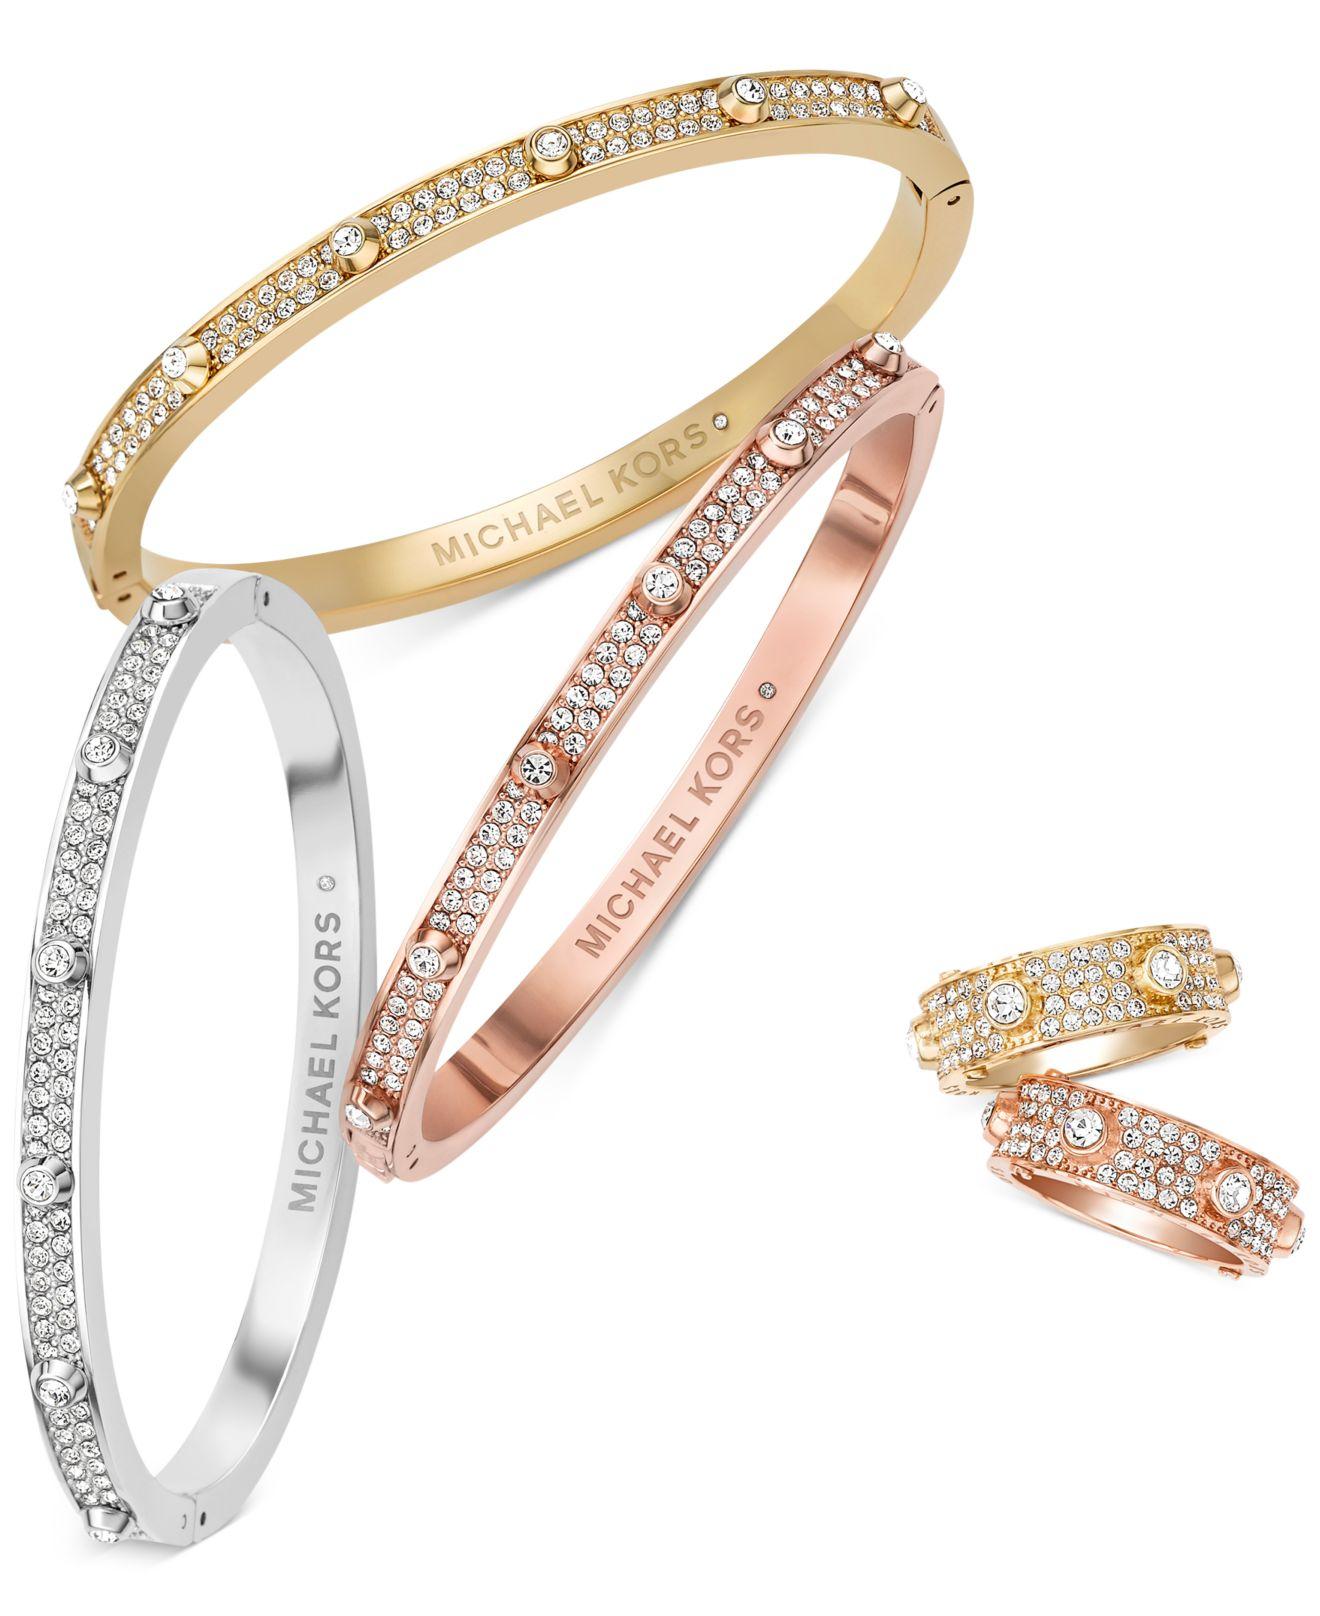 e41efd251db6 Lyst - Michael Kors Rose Gold-Tone Crystal Hinge Bangle Bracelet in ...